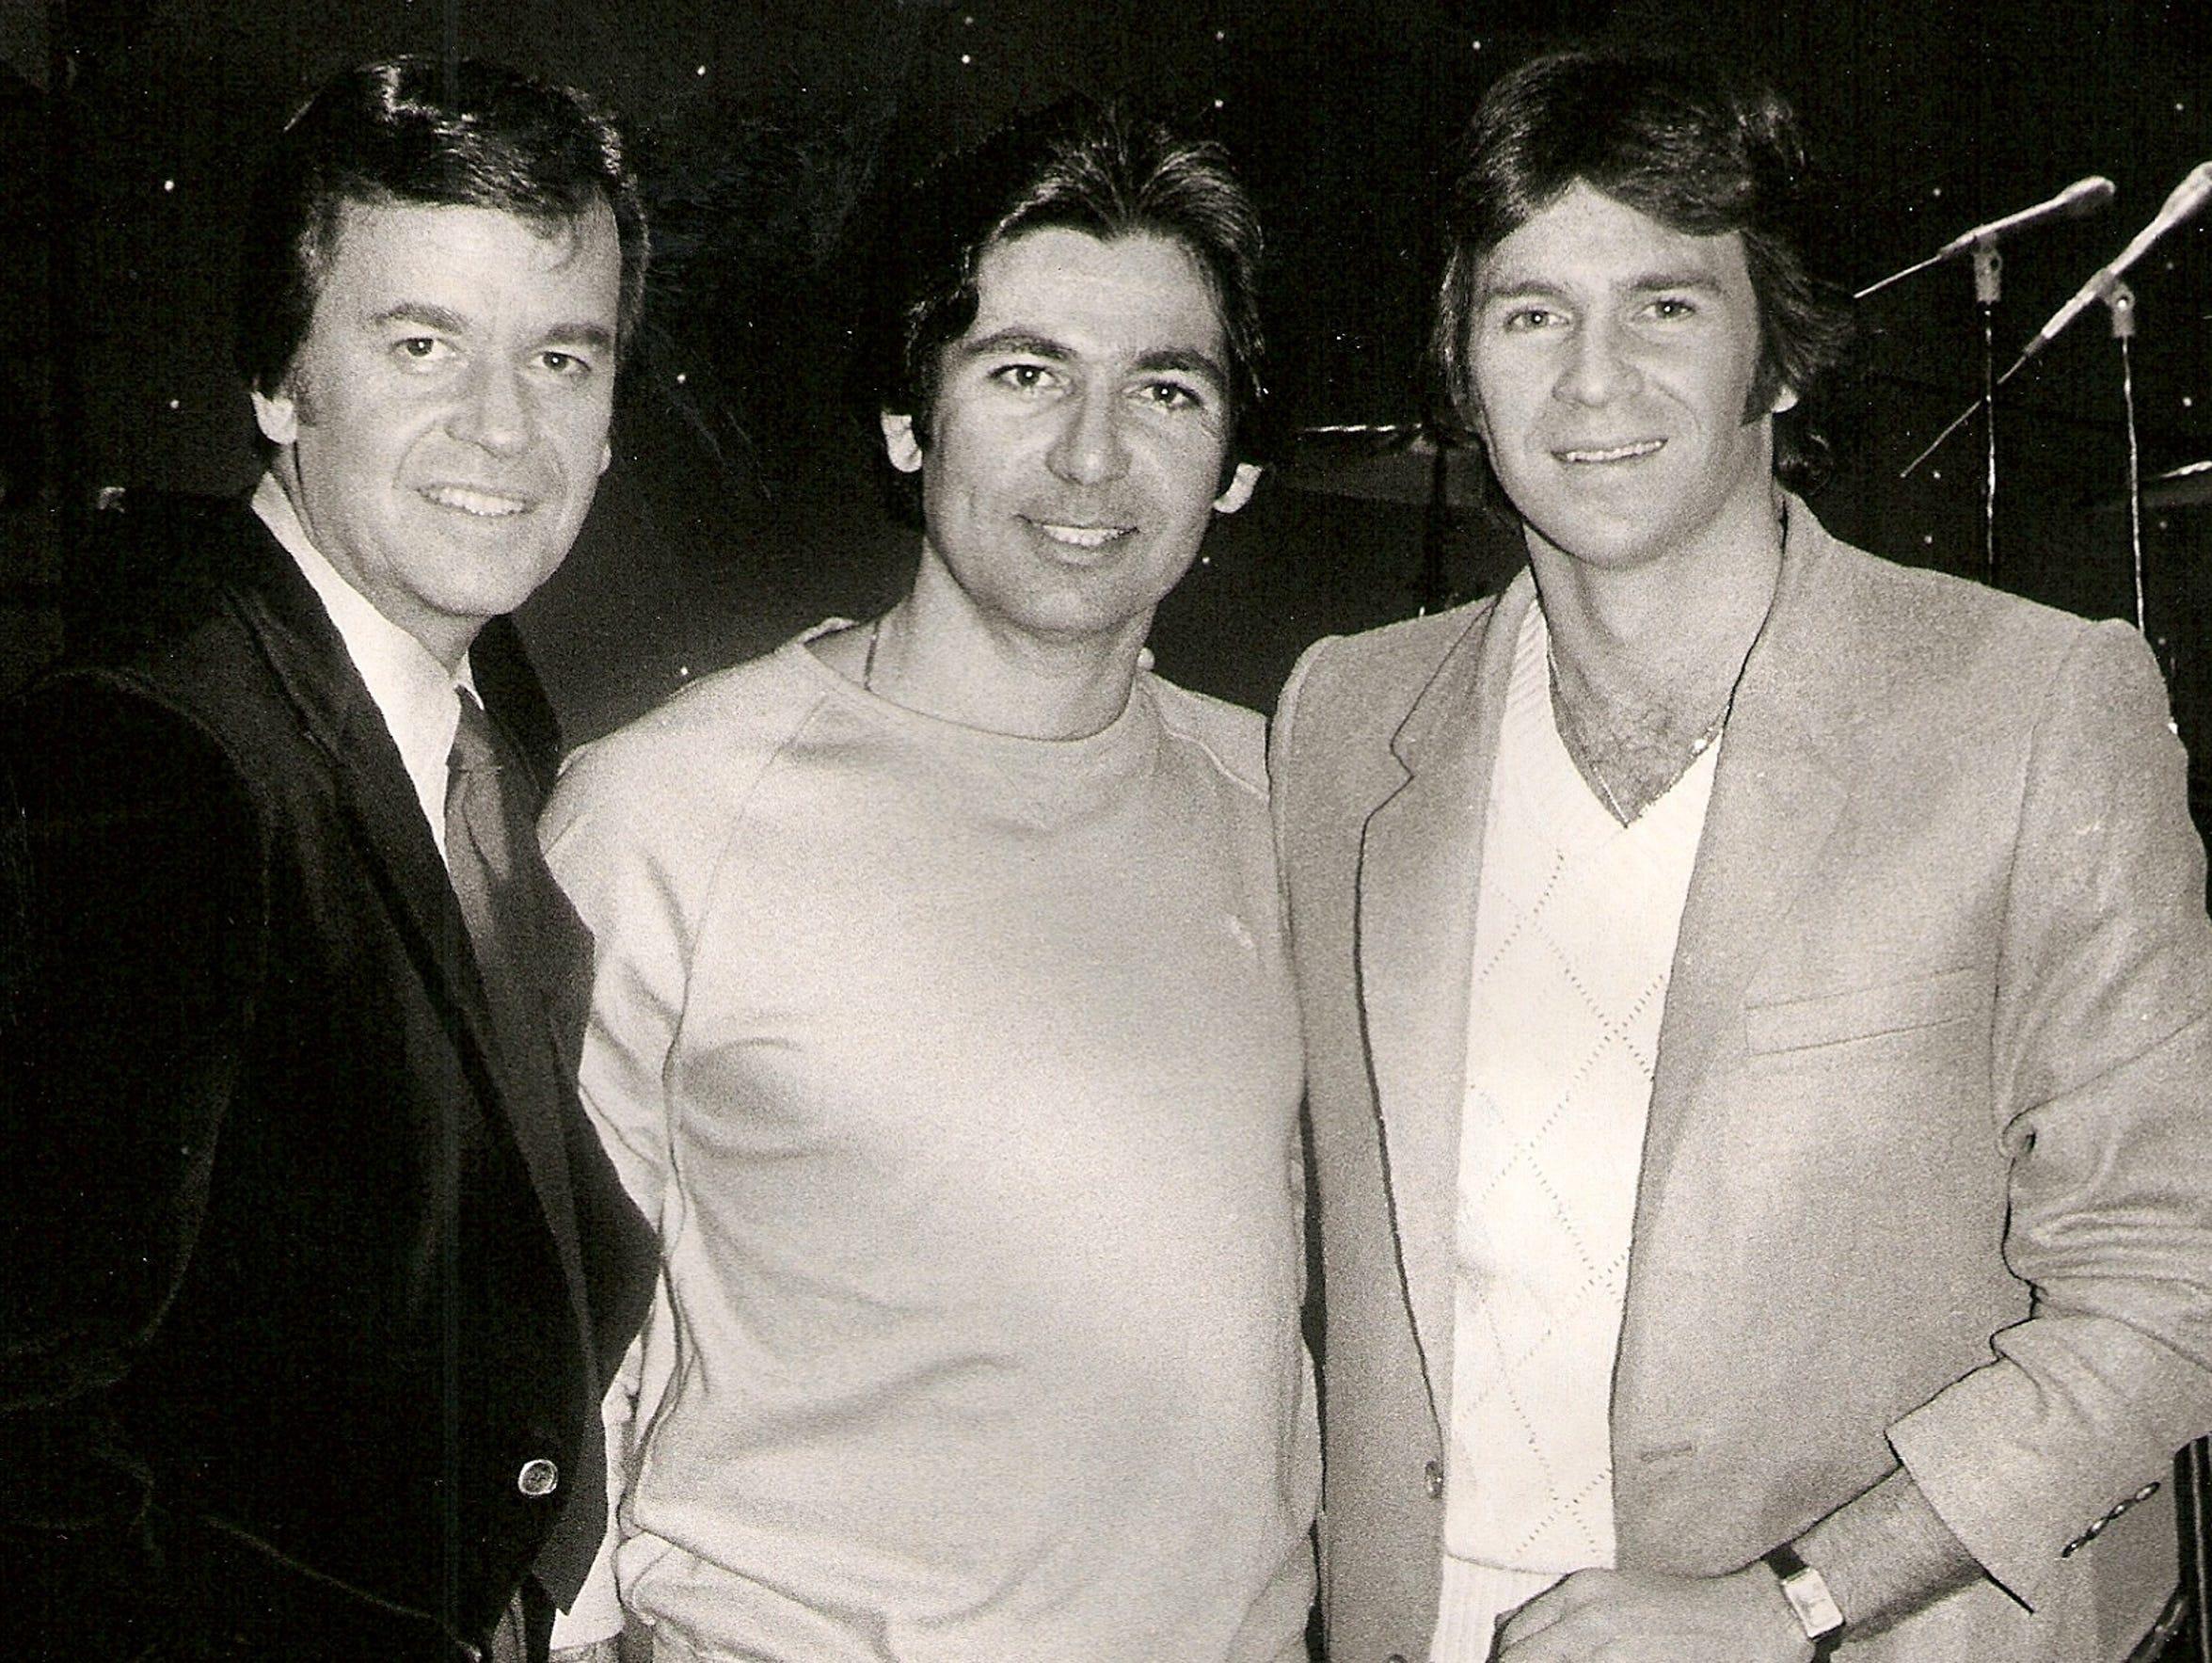 From left: Dick Clark, Robert Kardashian and Chris